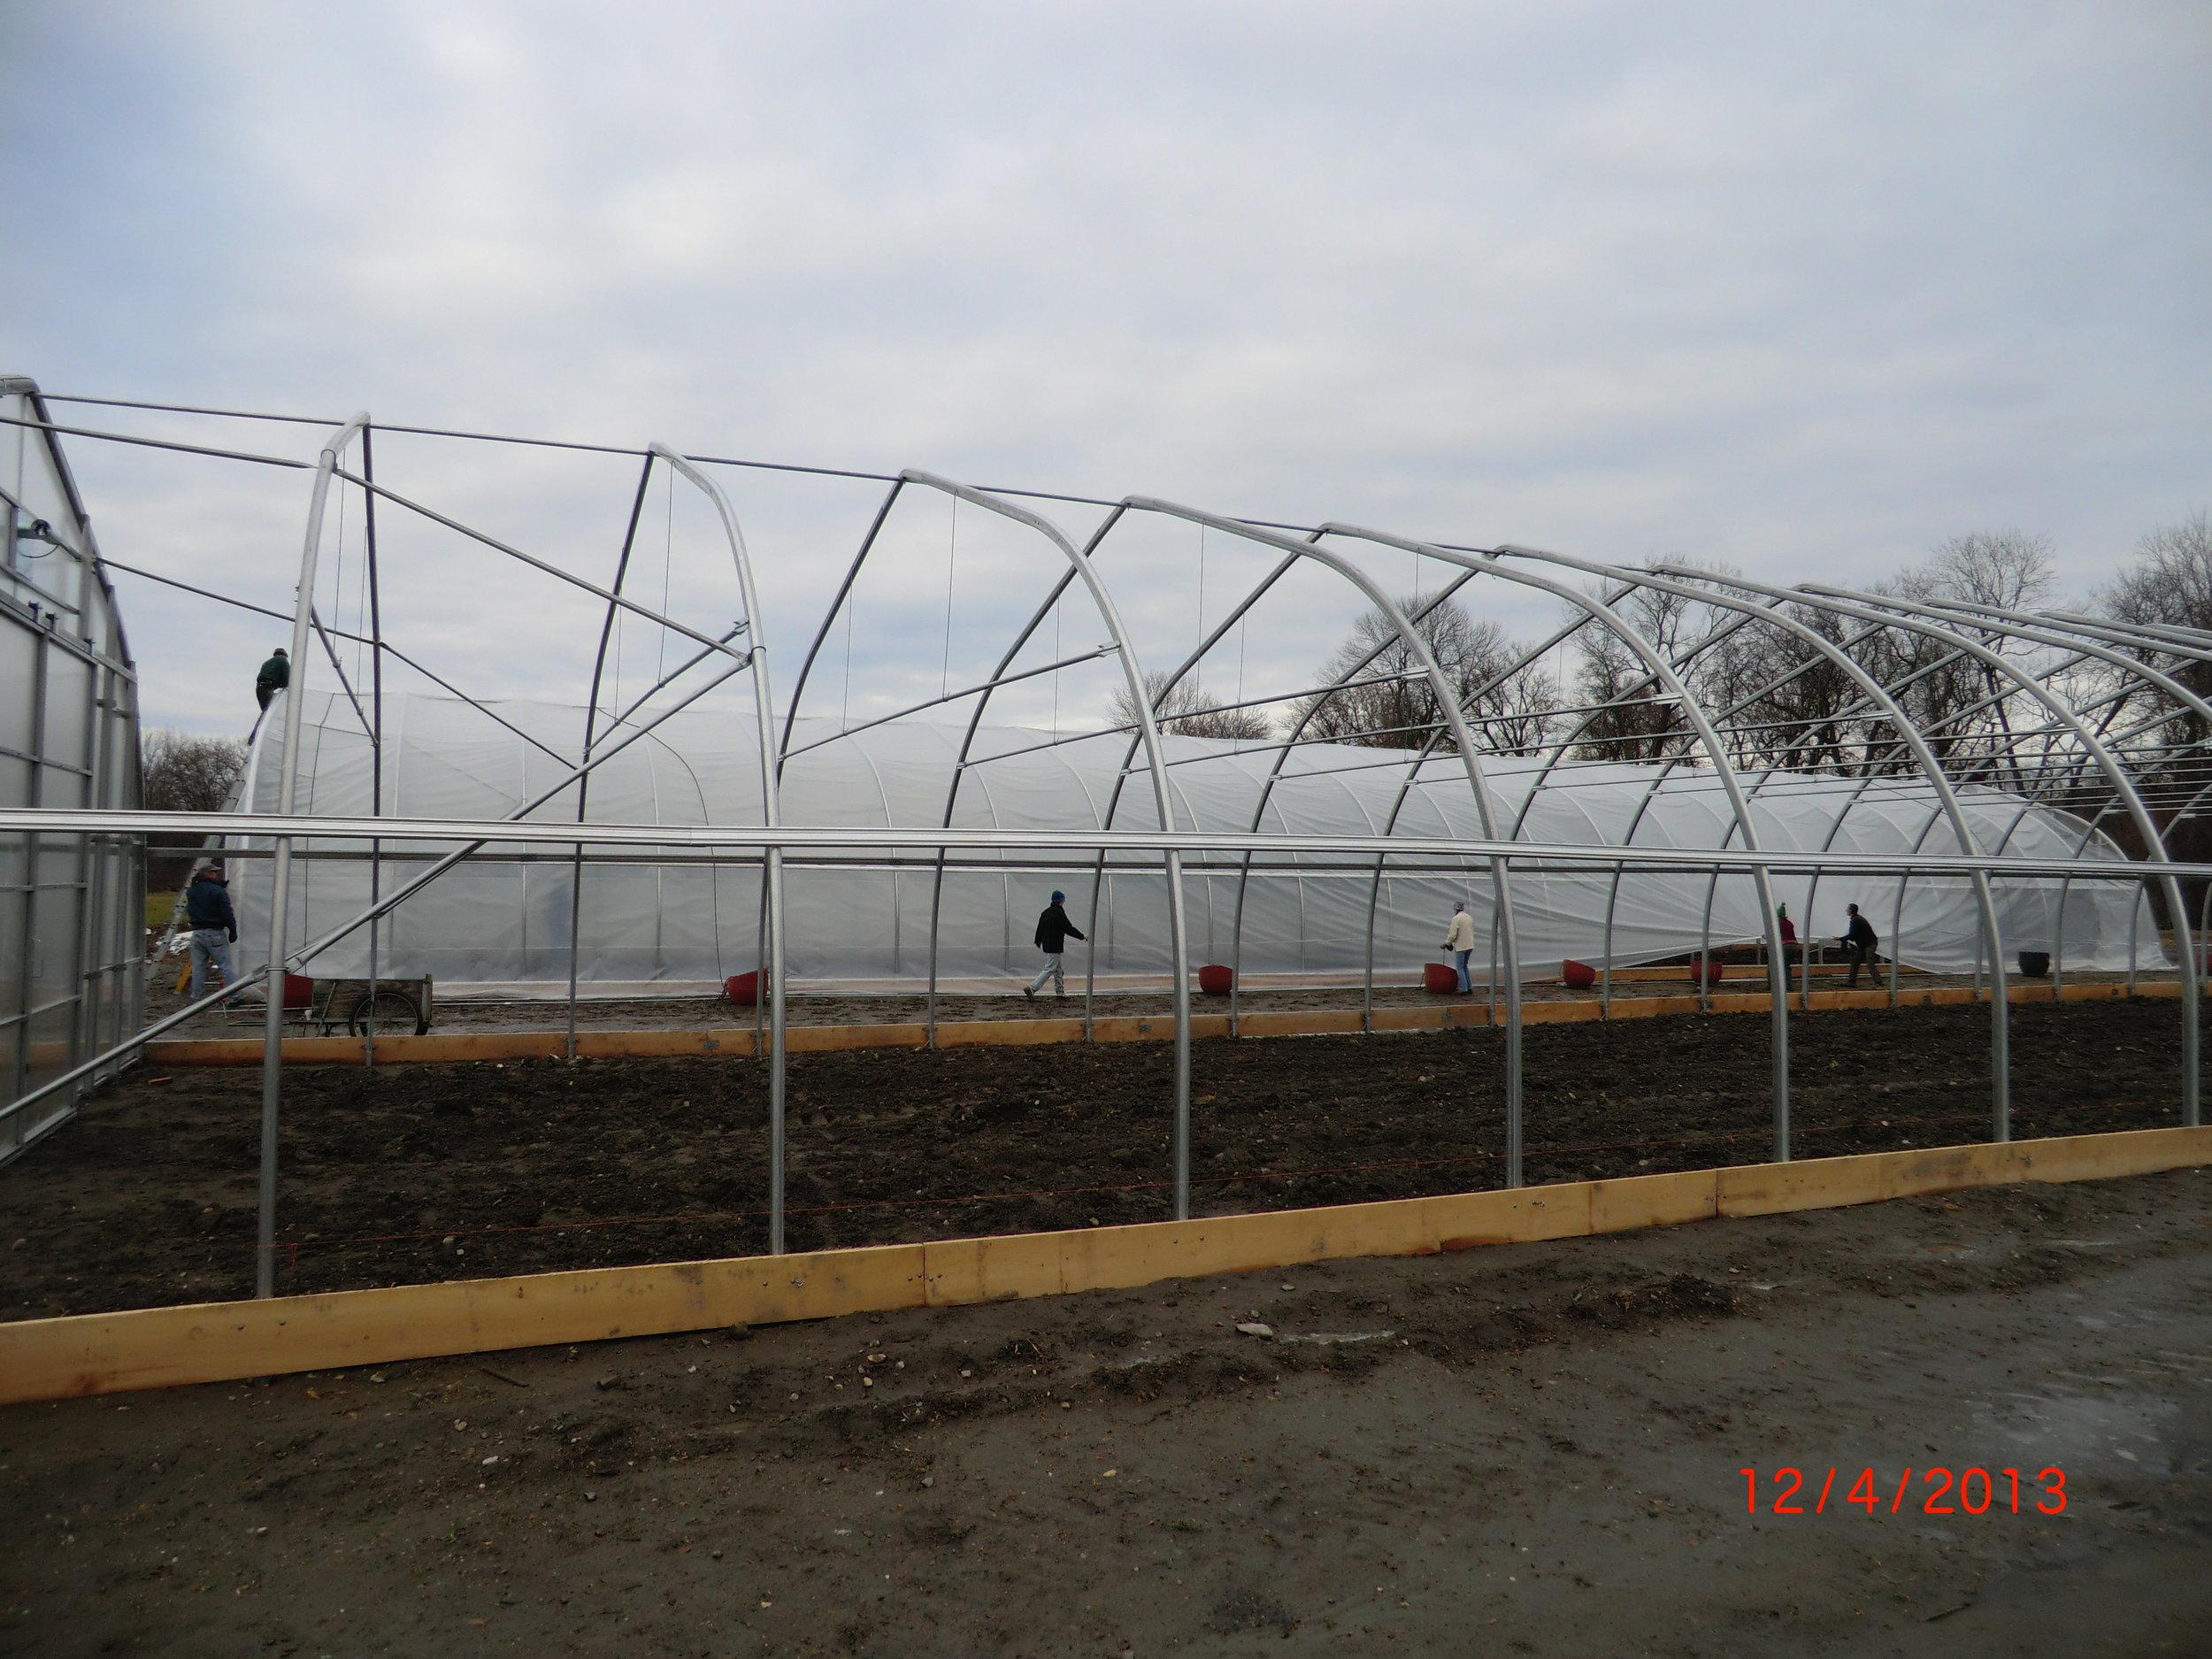 Greenhouse #1 12-4-2013 2-53-28 PM